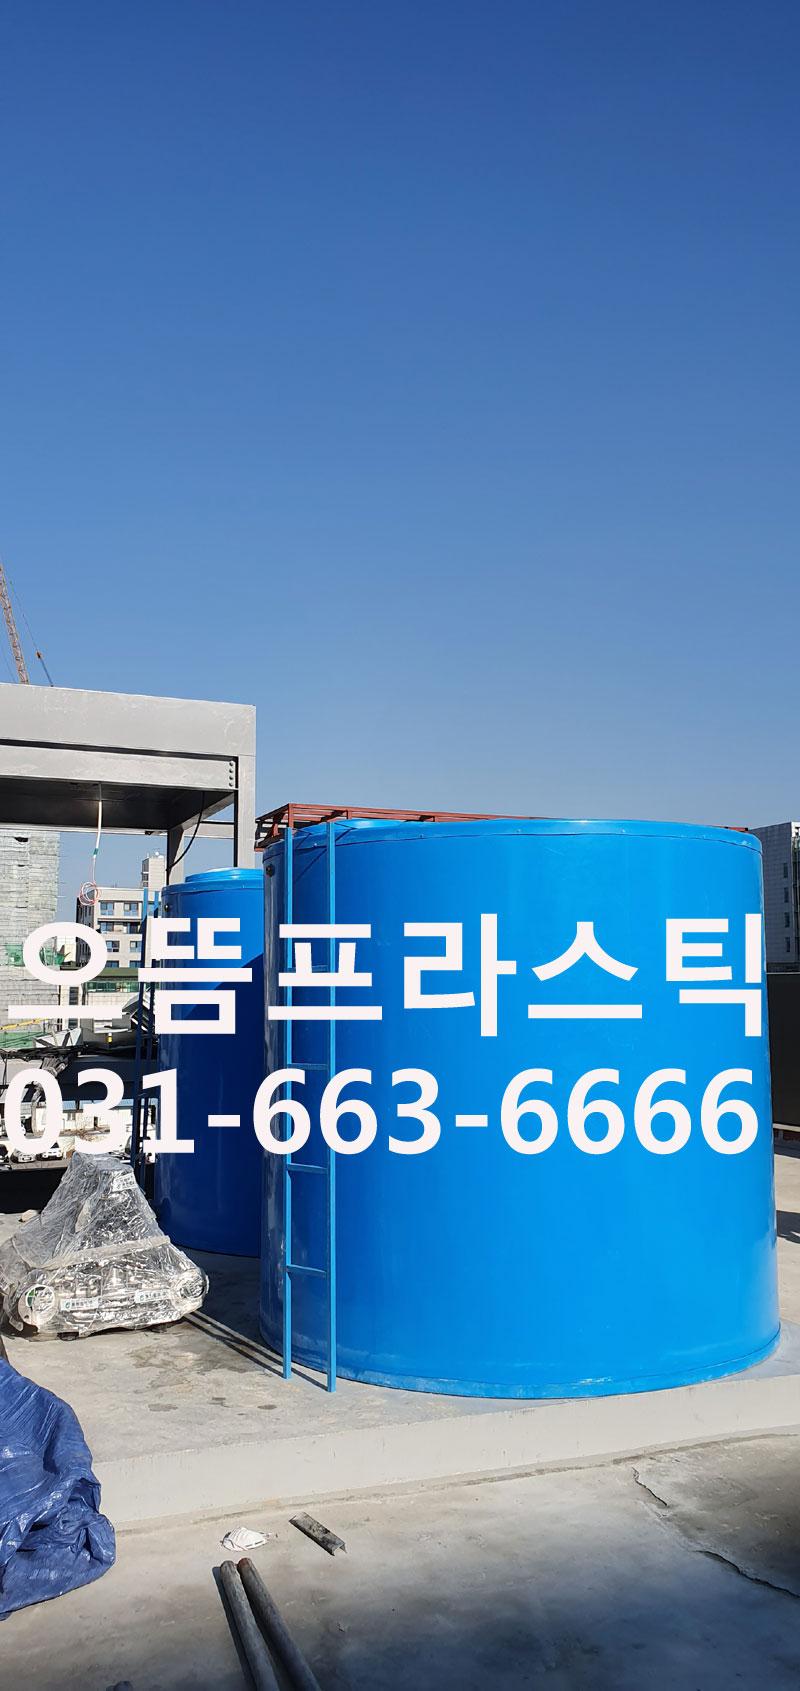 bc8a3508684248dcf64821a6d33ba2fe_1613714974_9003.jpg